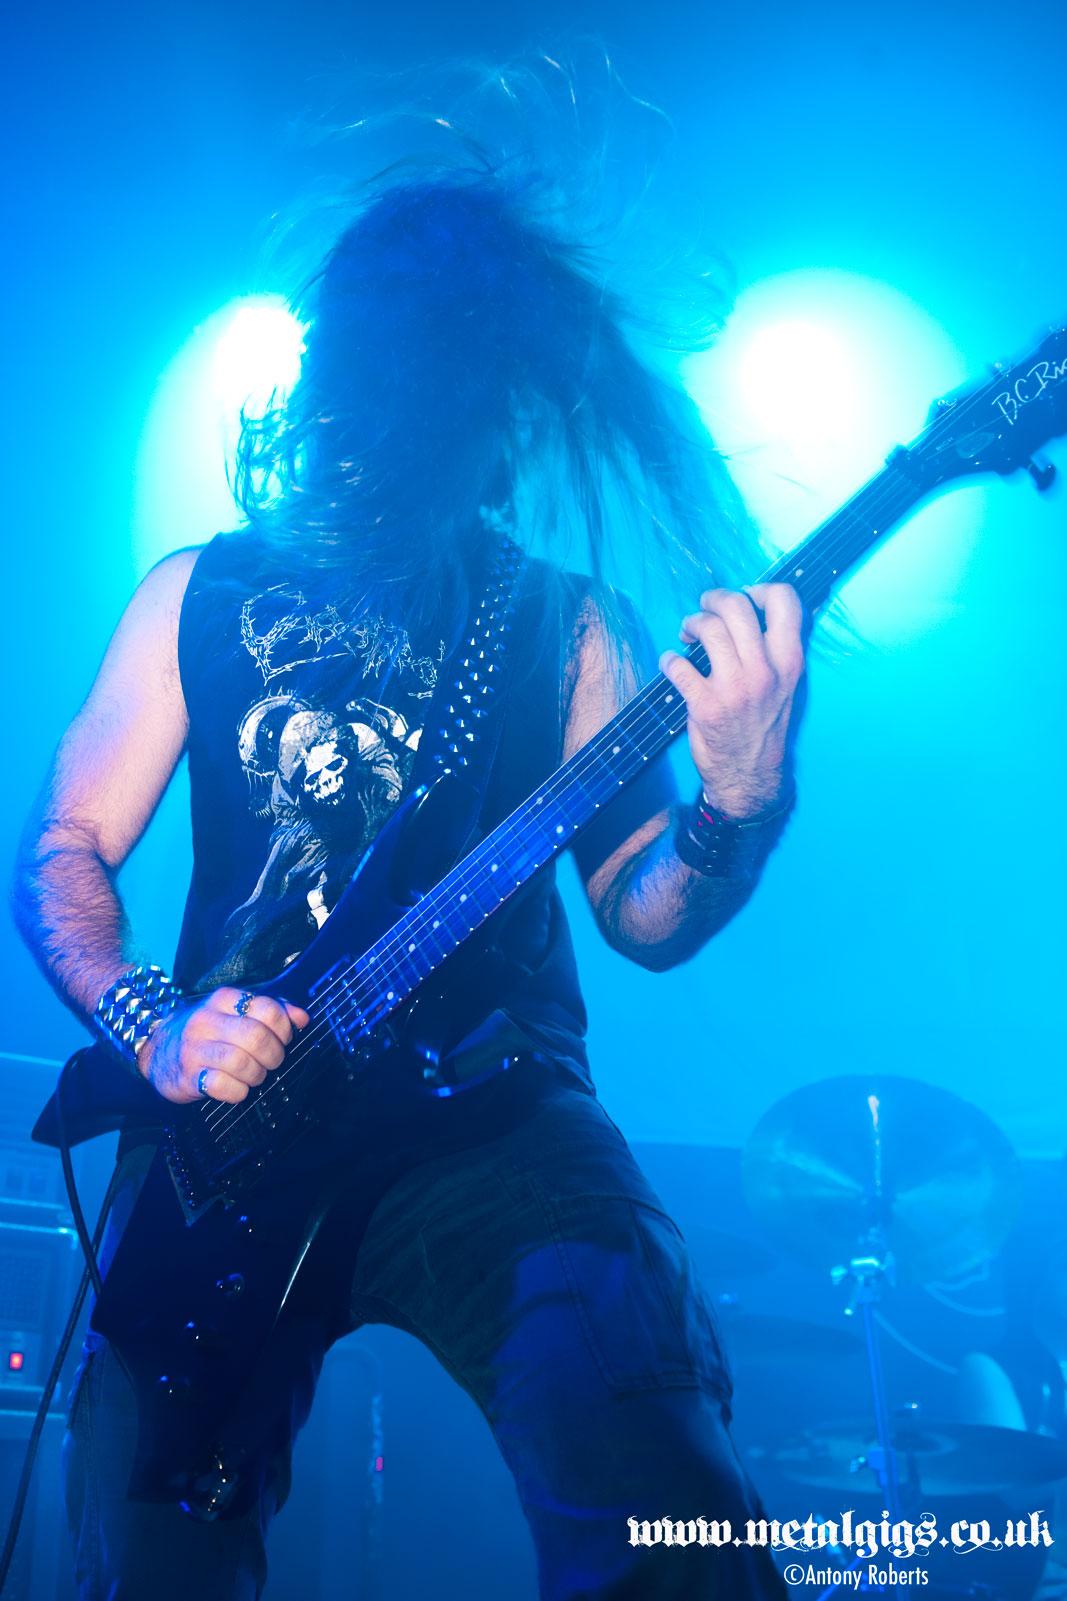 Grave-Miasma-Bull-and-Gate-Highbury-London-Antony-Roberts-Death-Metal-Band